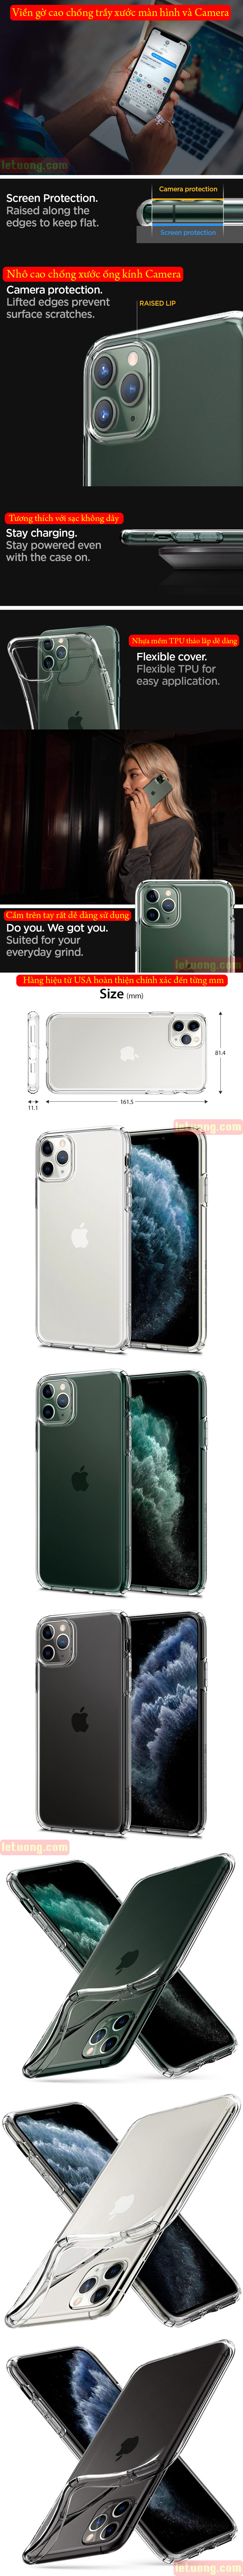 Ốp lưng iPhone 11 Pro Max Spigen Liquid Crystal nhựa mềm trong suốt ( USA ) 2